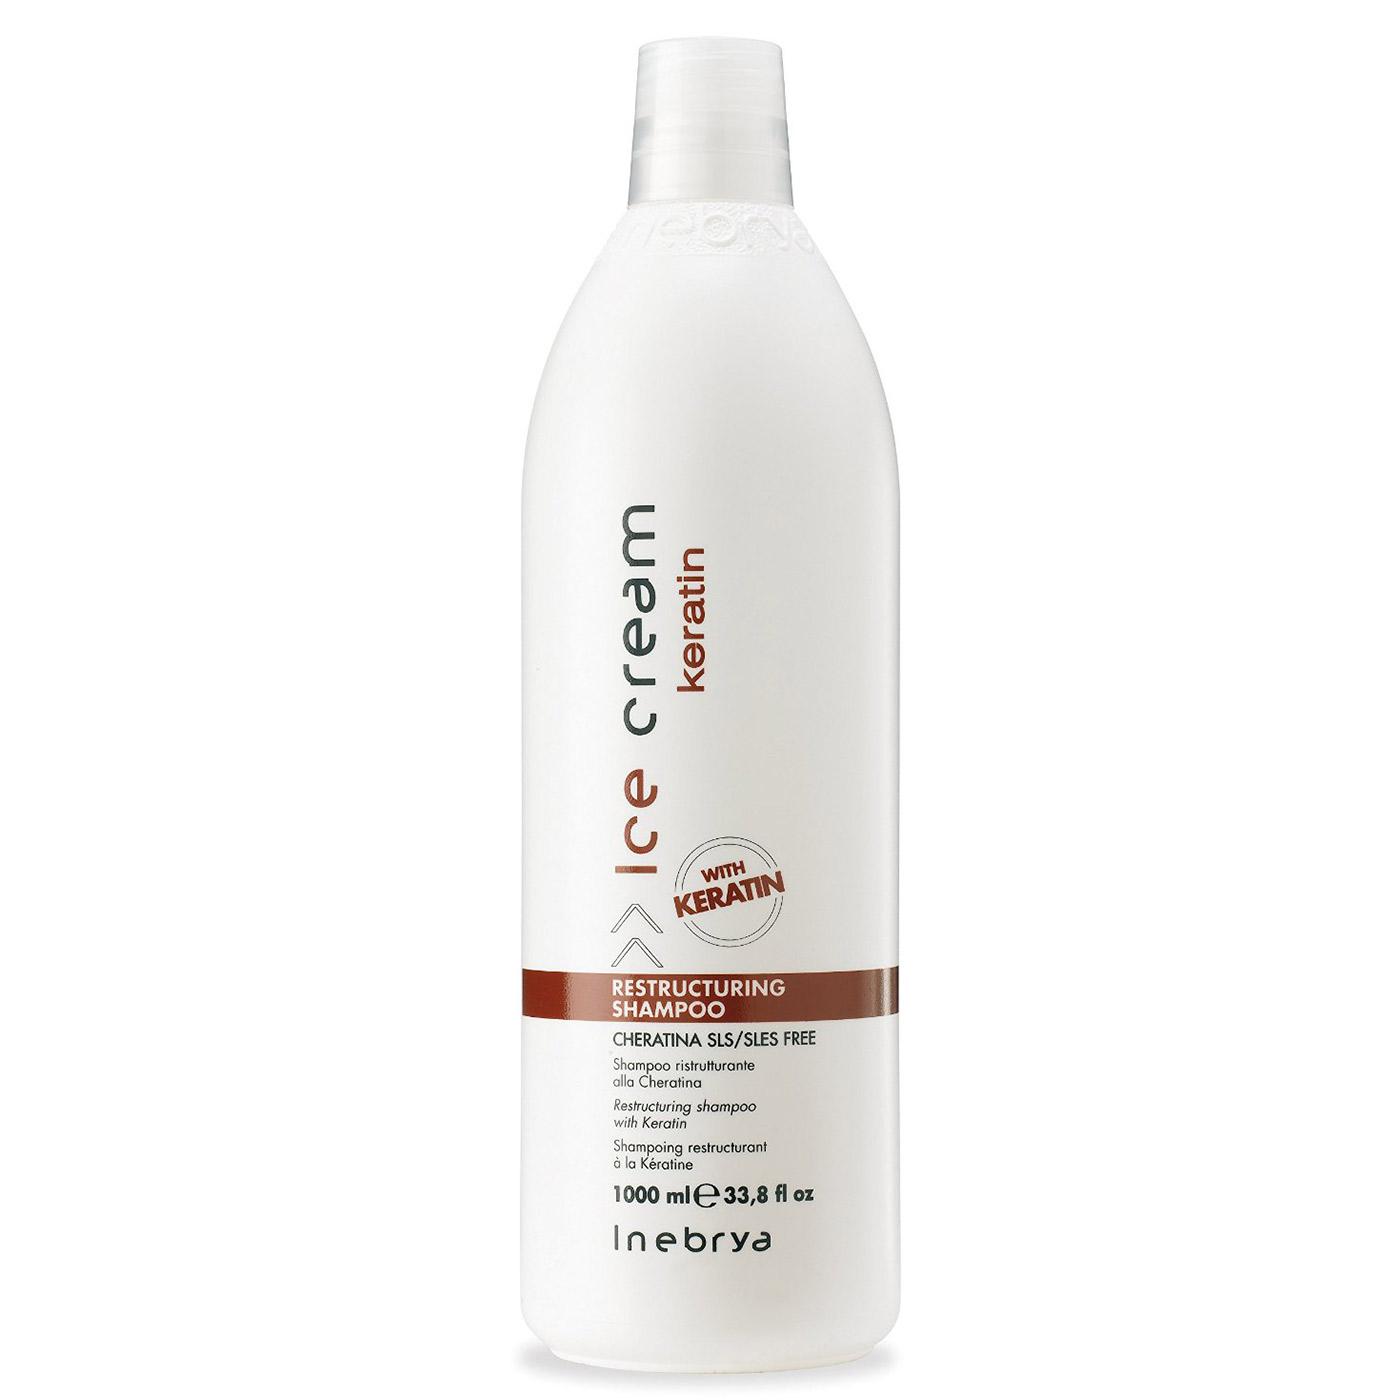 Extrêmement Inebrya - Shampoing Sans Sulfate - à la Kératine - 1000 ml  OG84